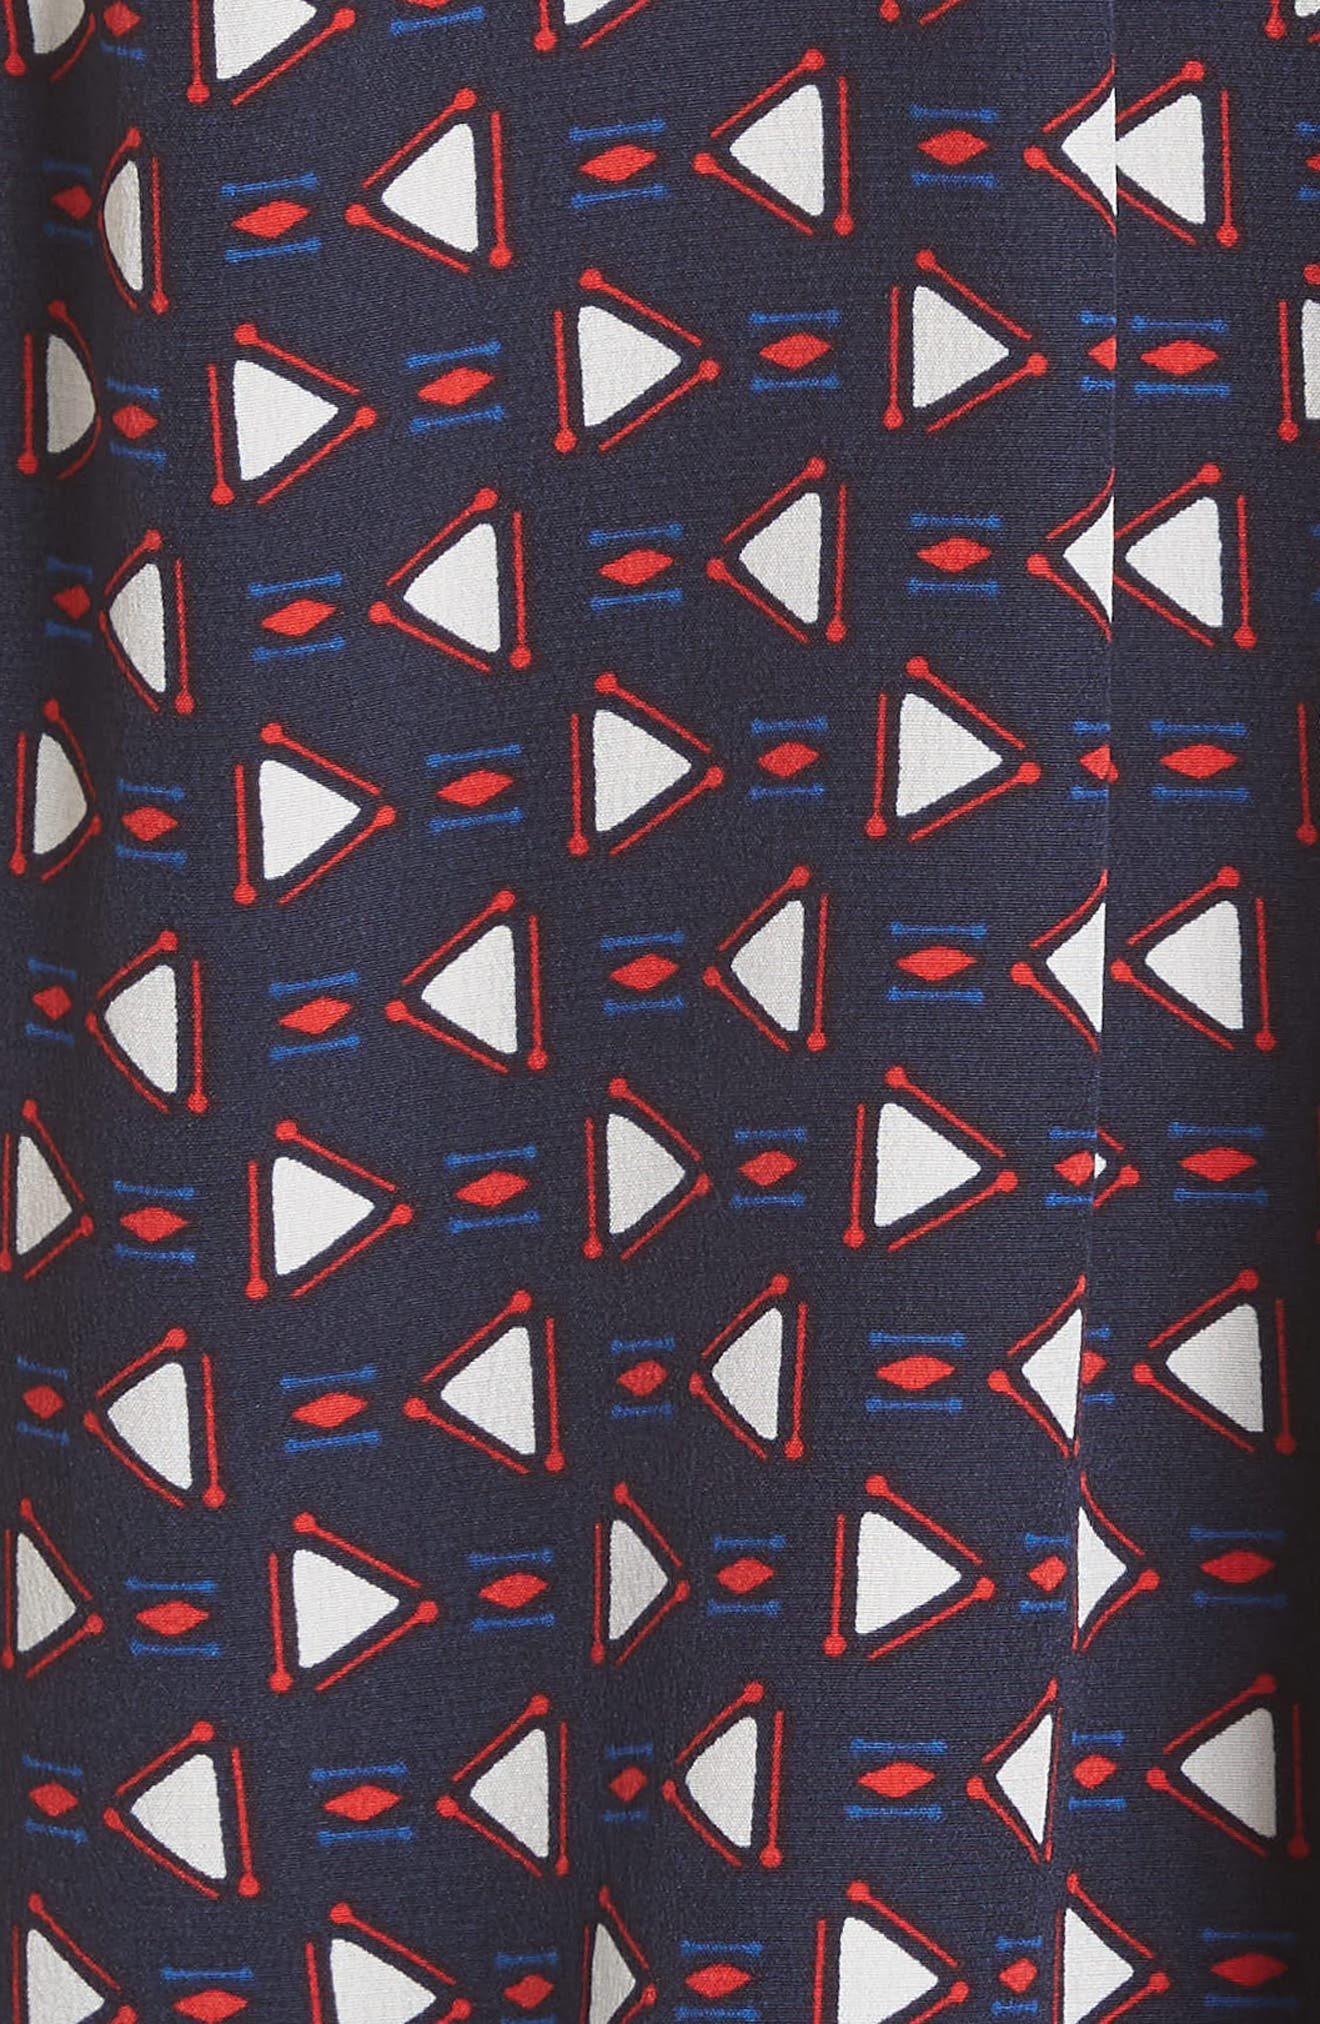 Xandry B Silk Top,                             Alternate thumbnail 5, color,                             410